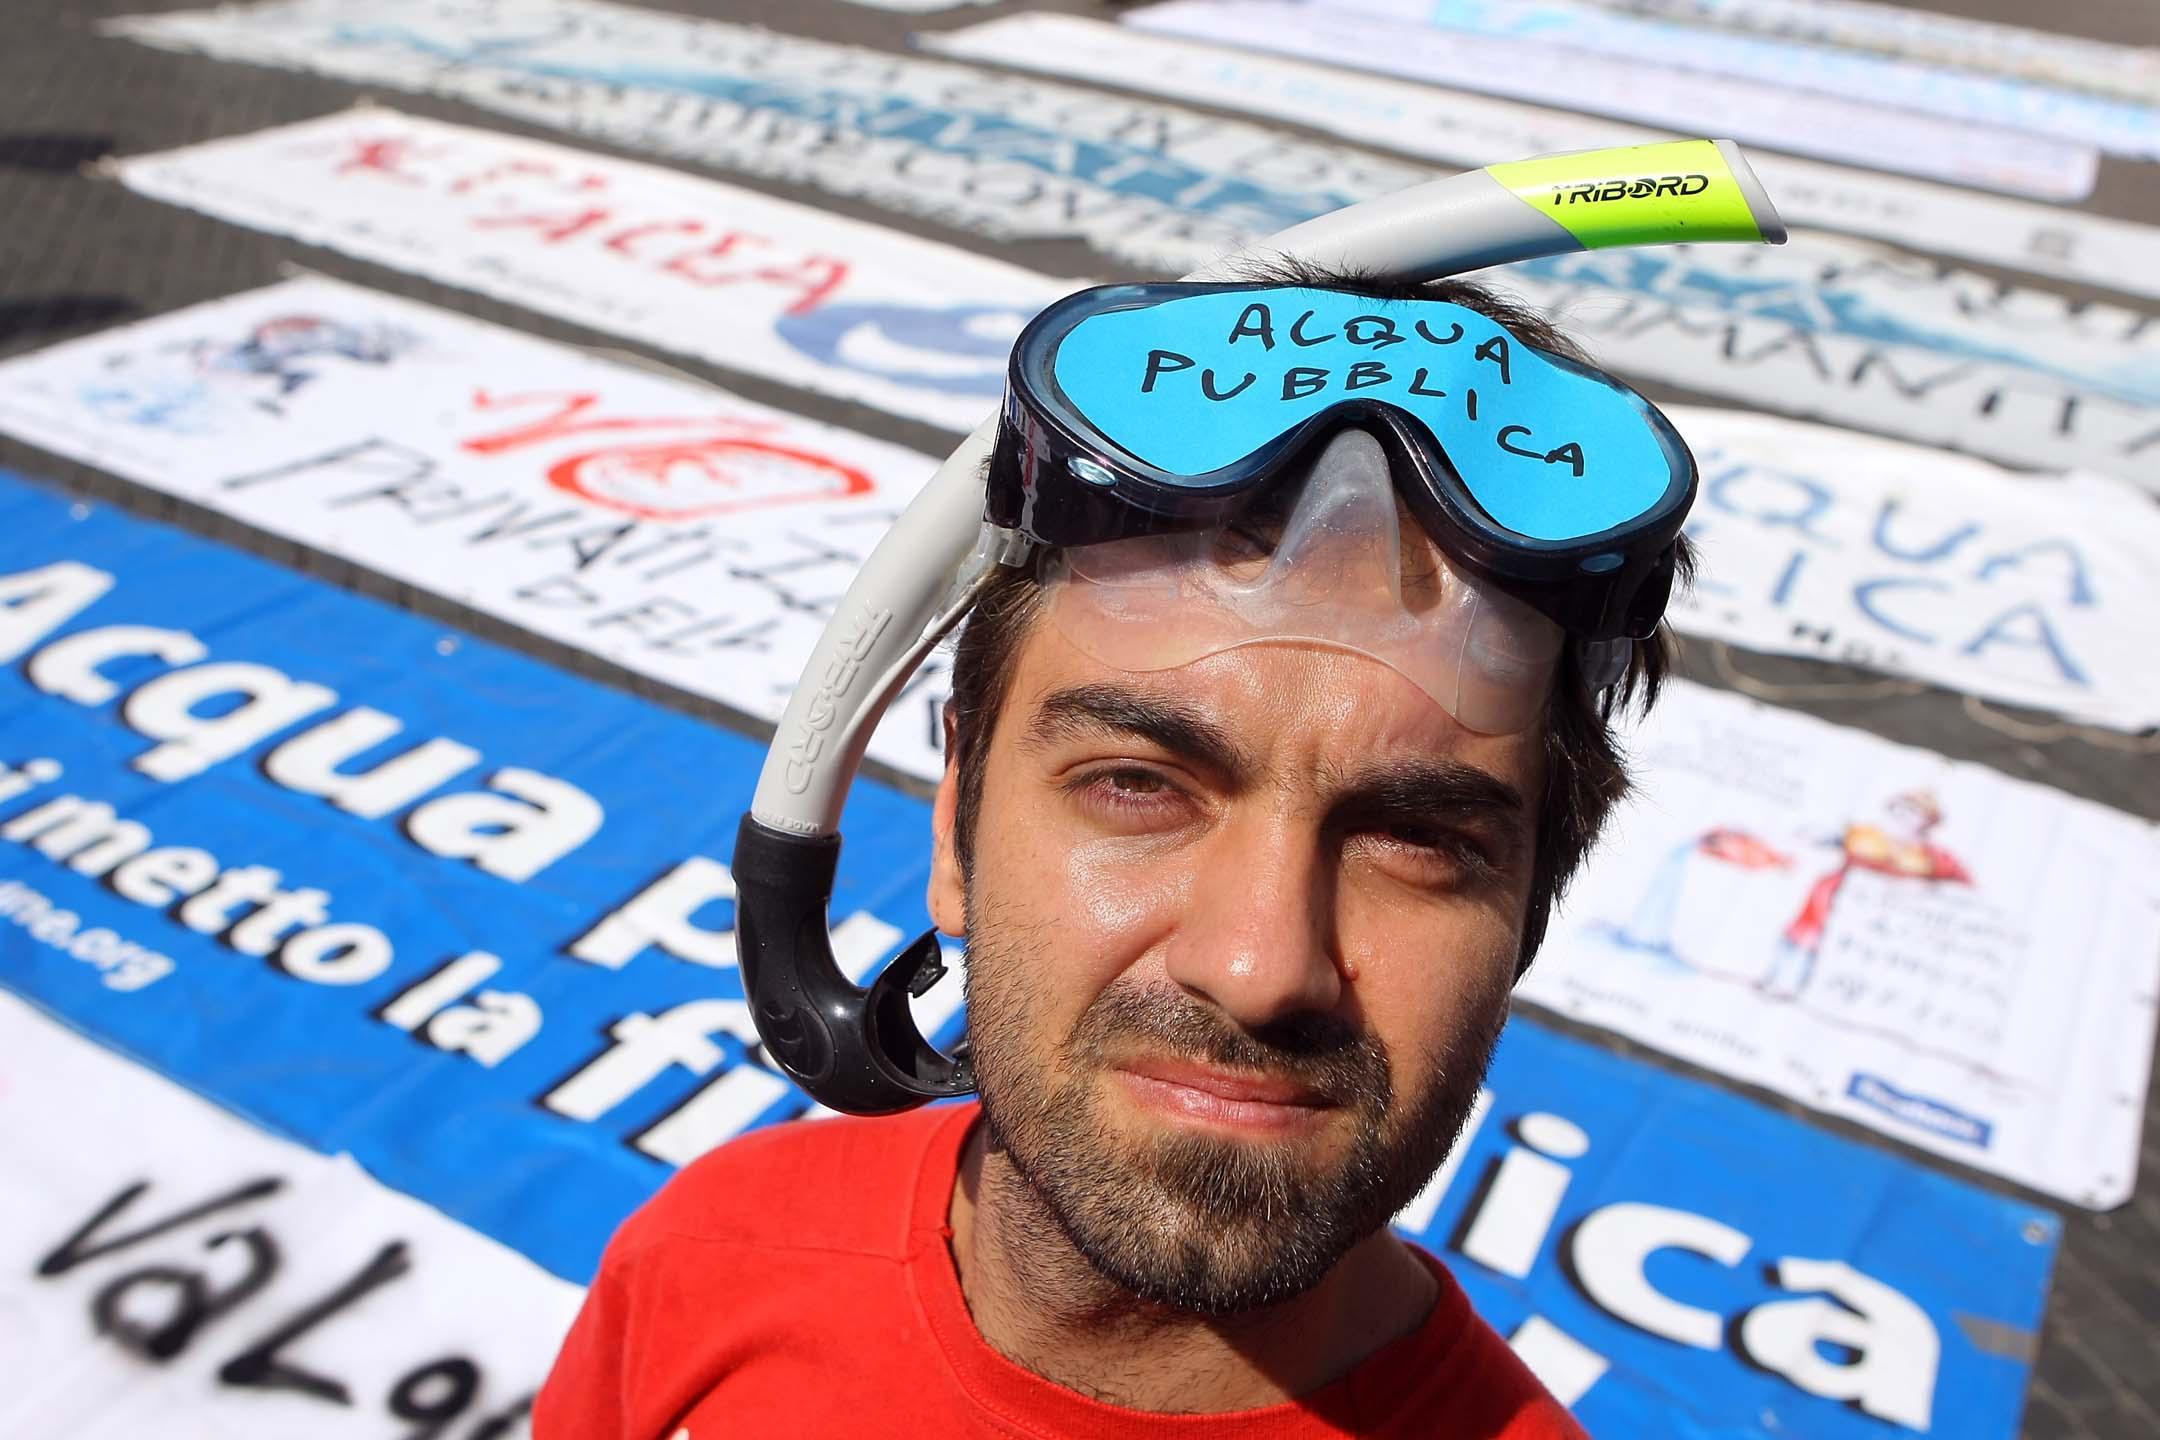 Un manifestante a piazza Navona (Lapresse)